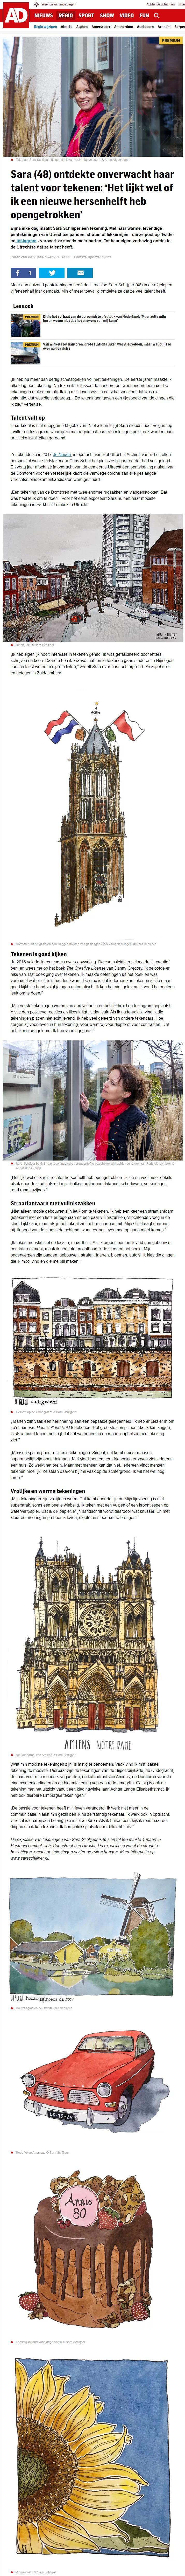 Afbeelding interview Sara Schlijper online versie AD Utrecht 16-01-2021